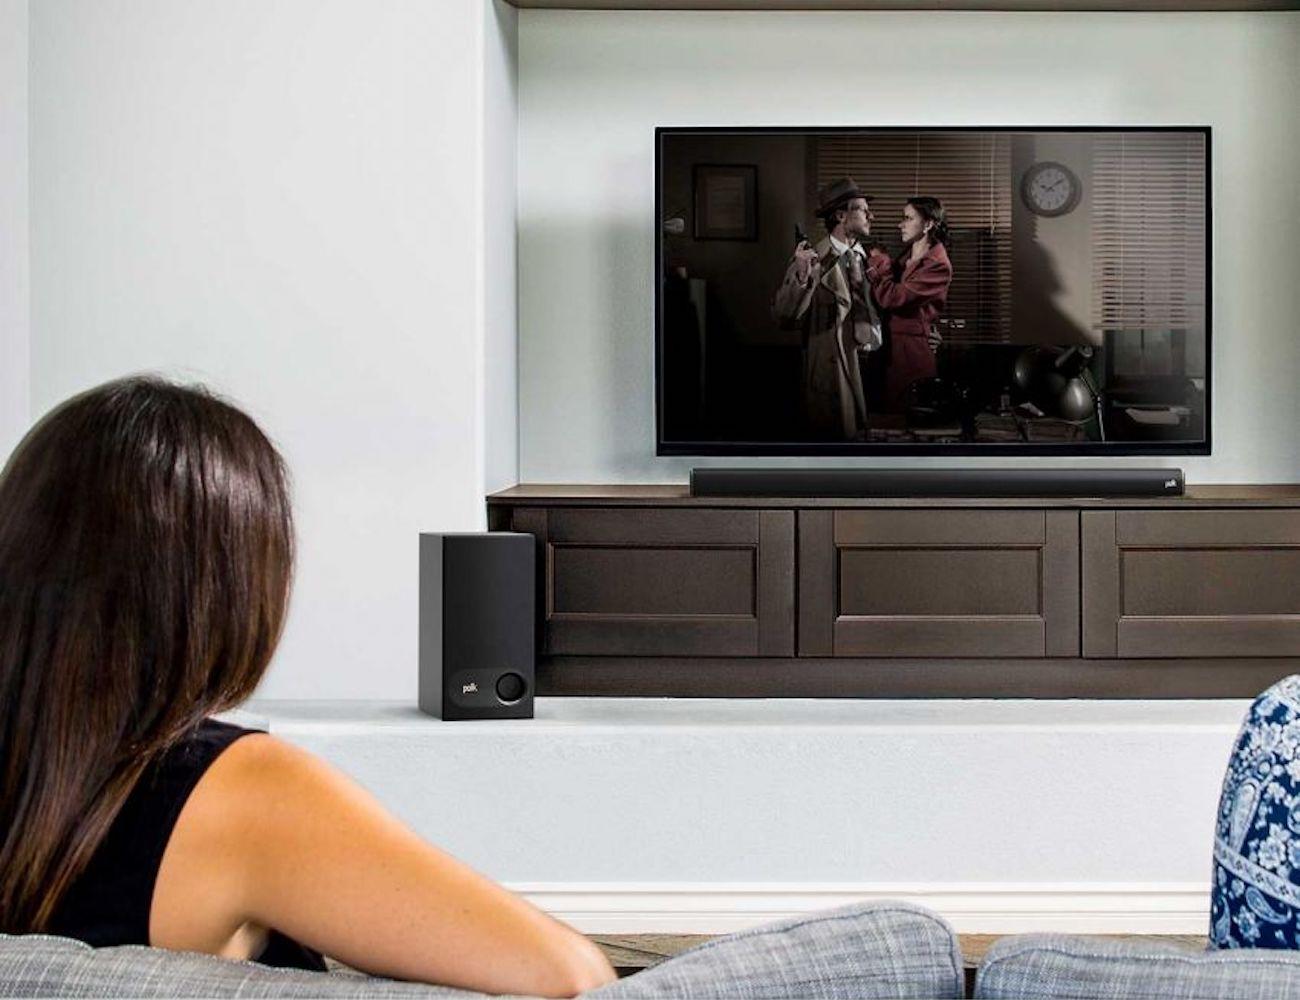 Polk+Signa+S1+Universal+TV+Sound+Bar